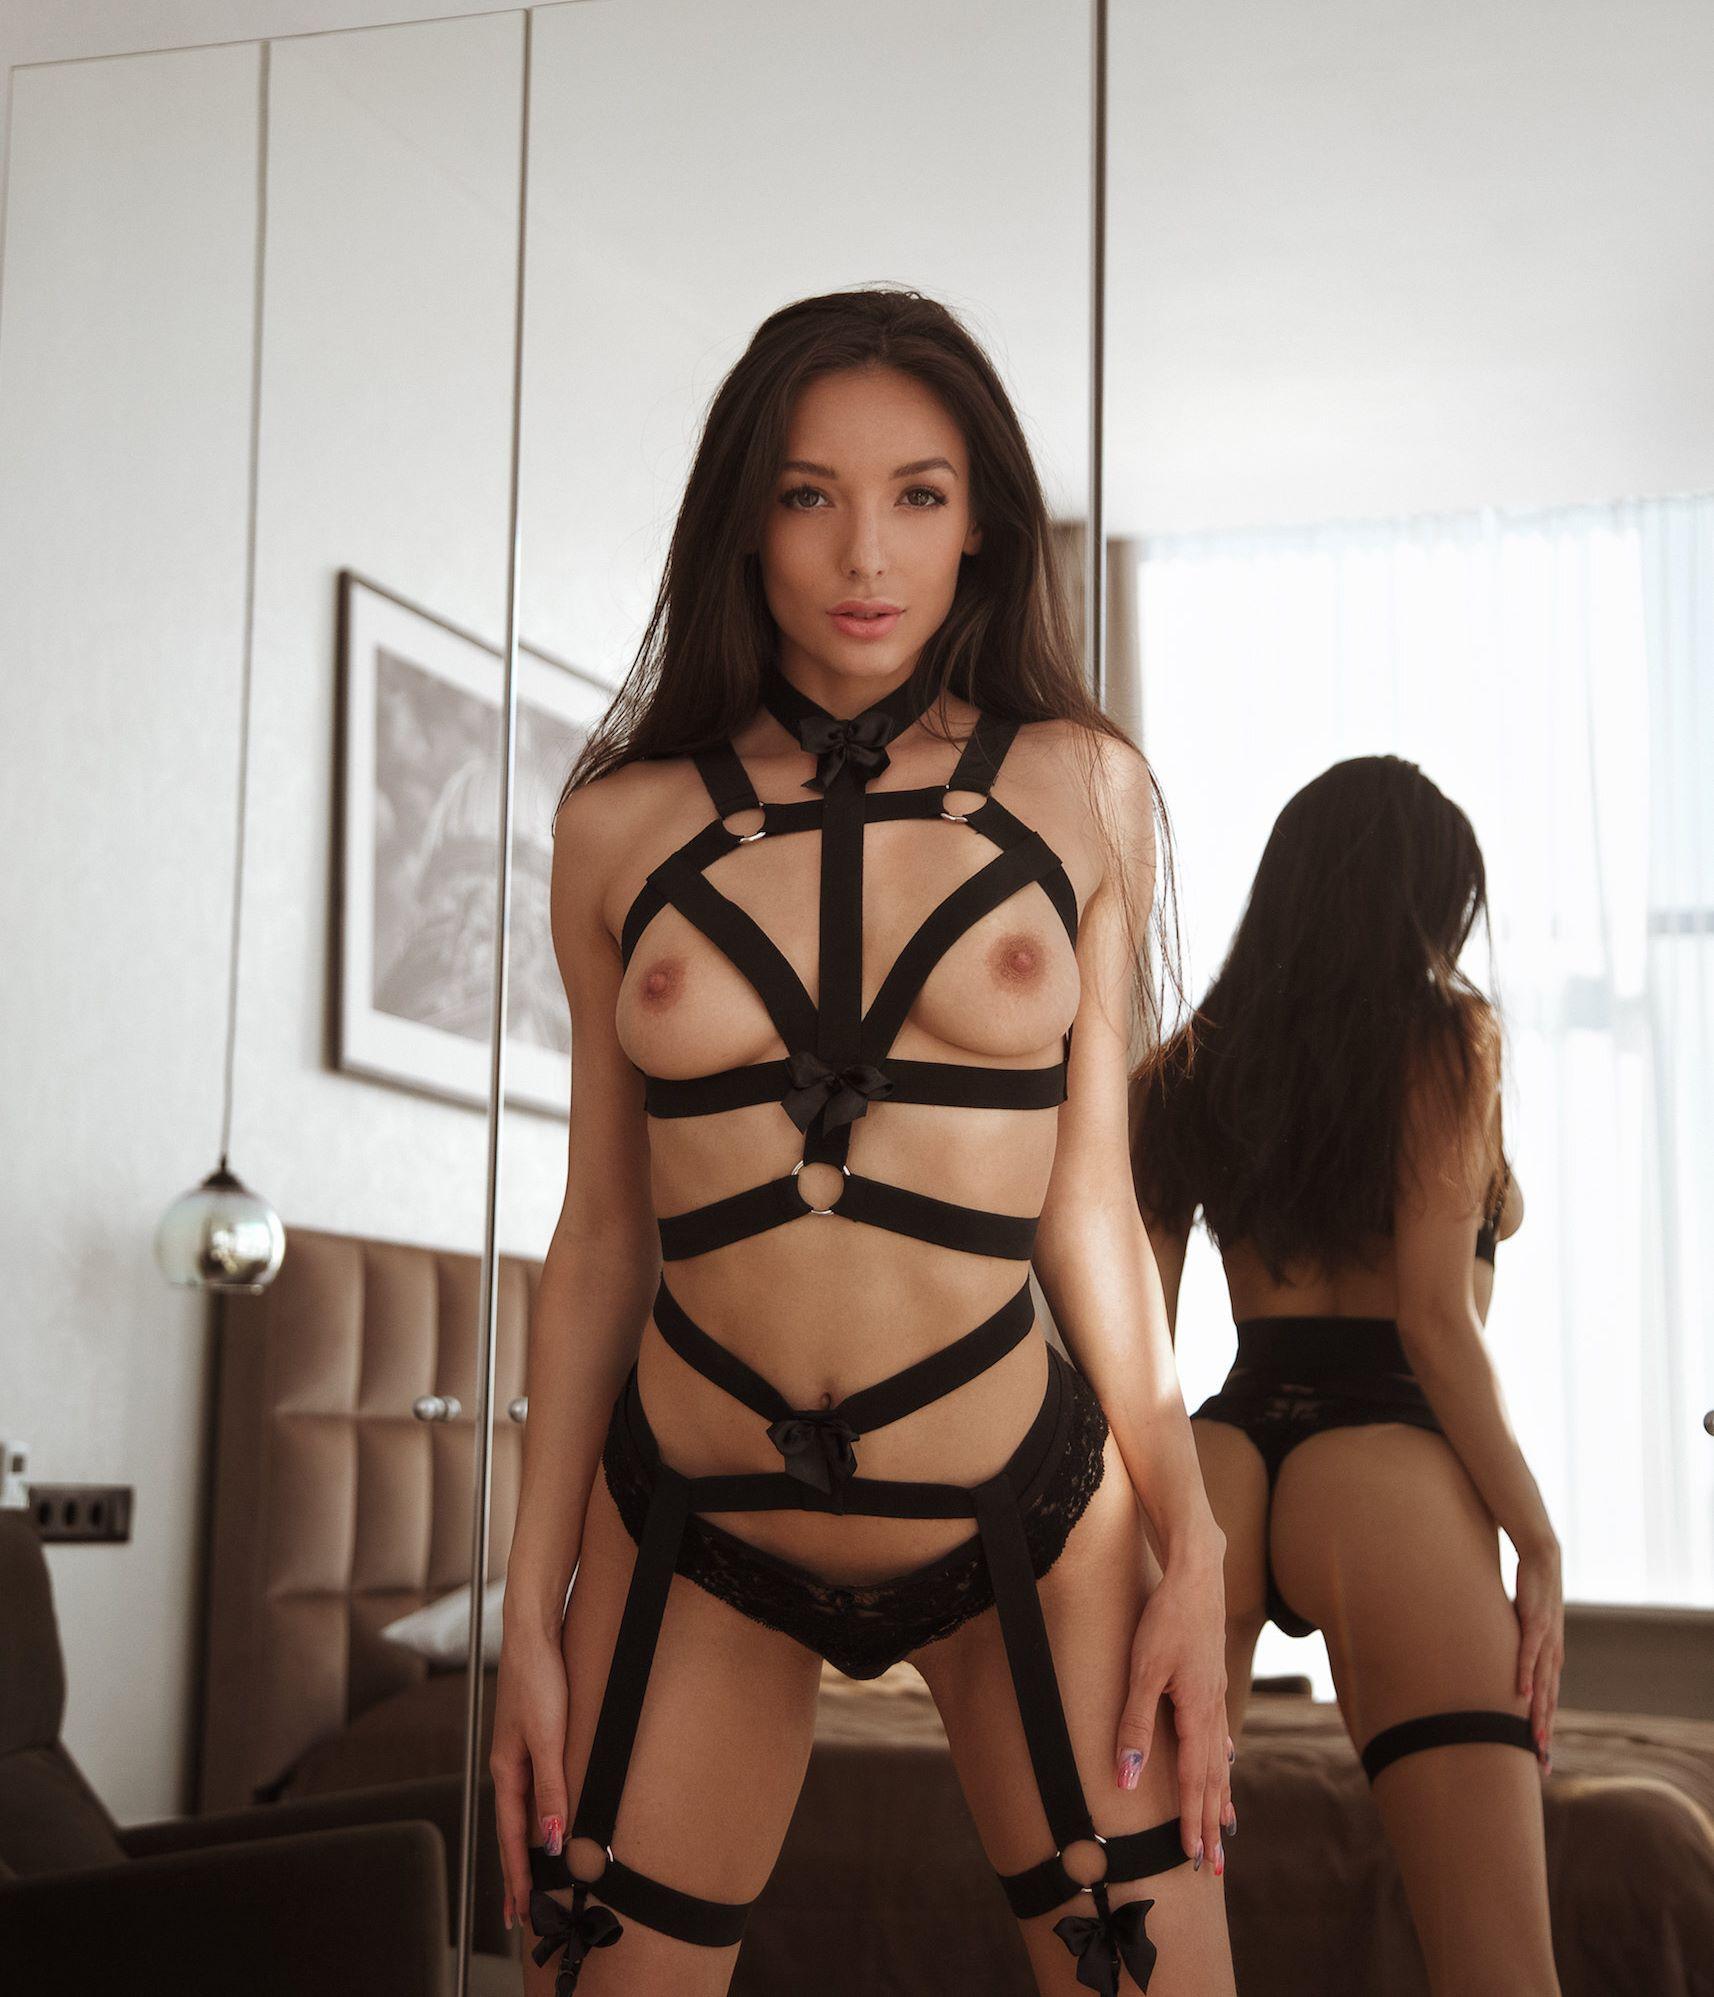 🌸 MONIKA_BLOSSOM🌸 Camgirl , Adult Content Creator